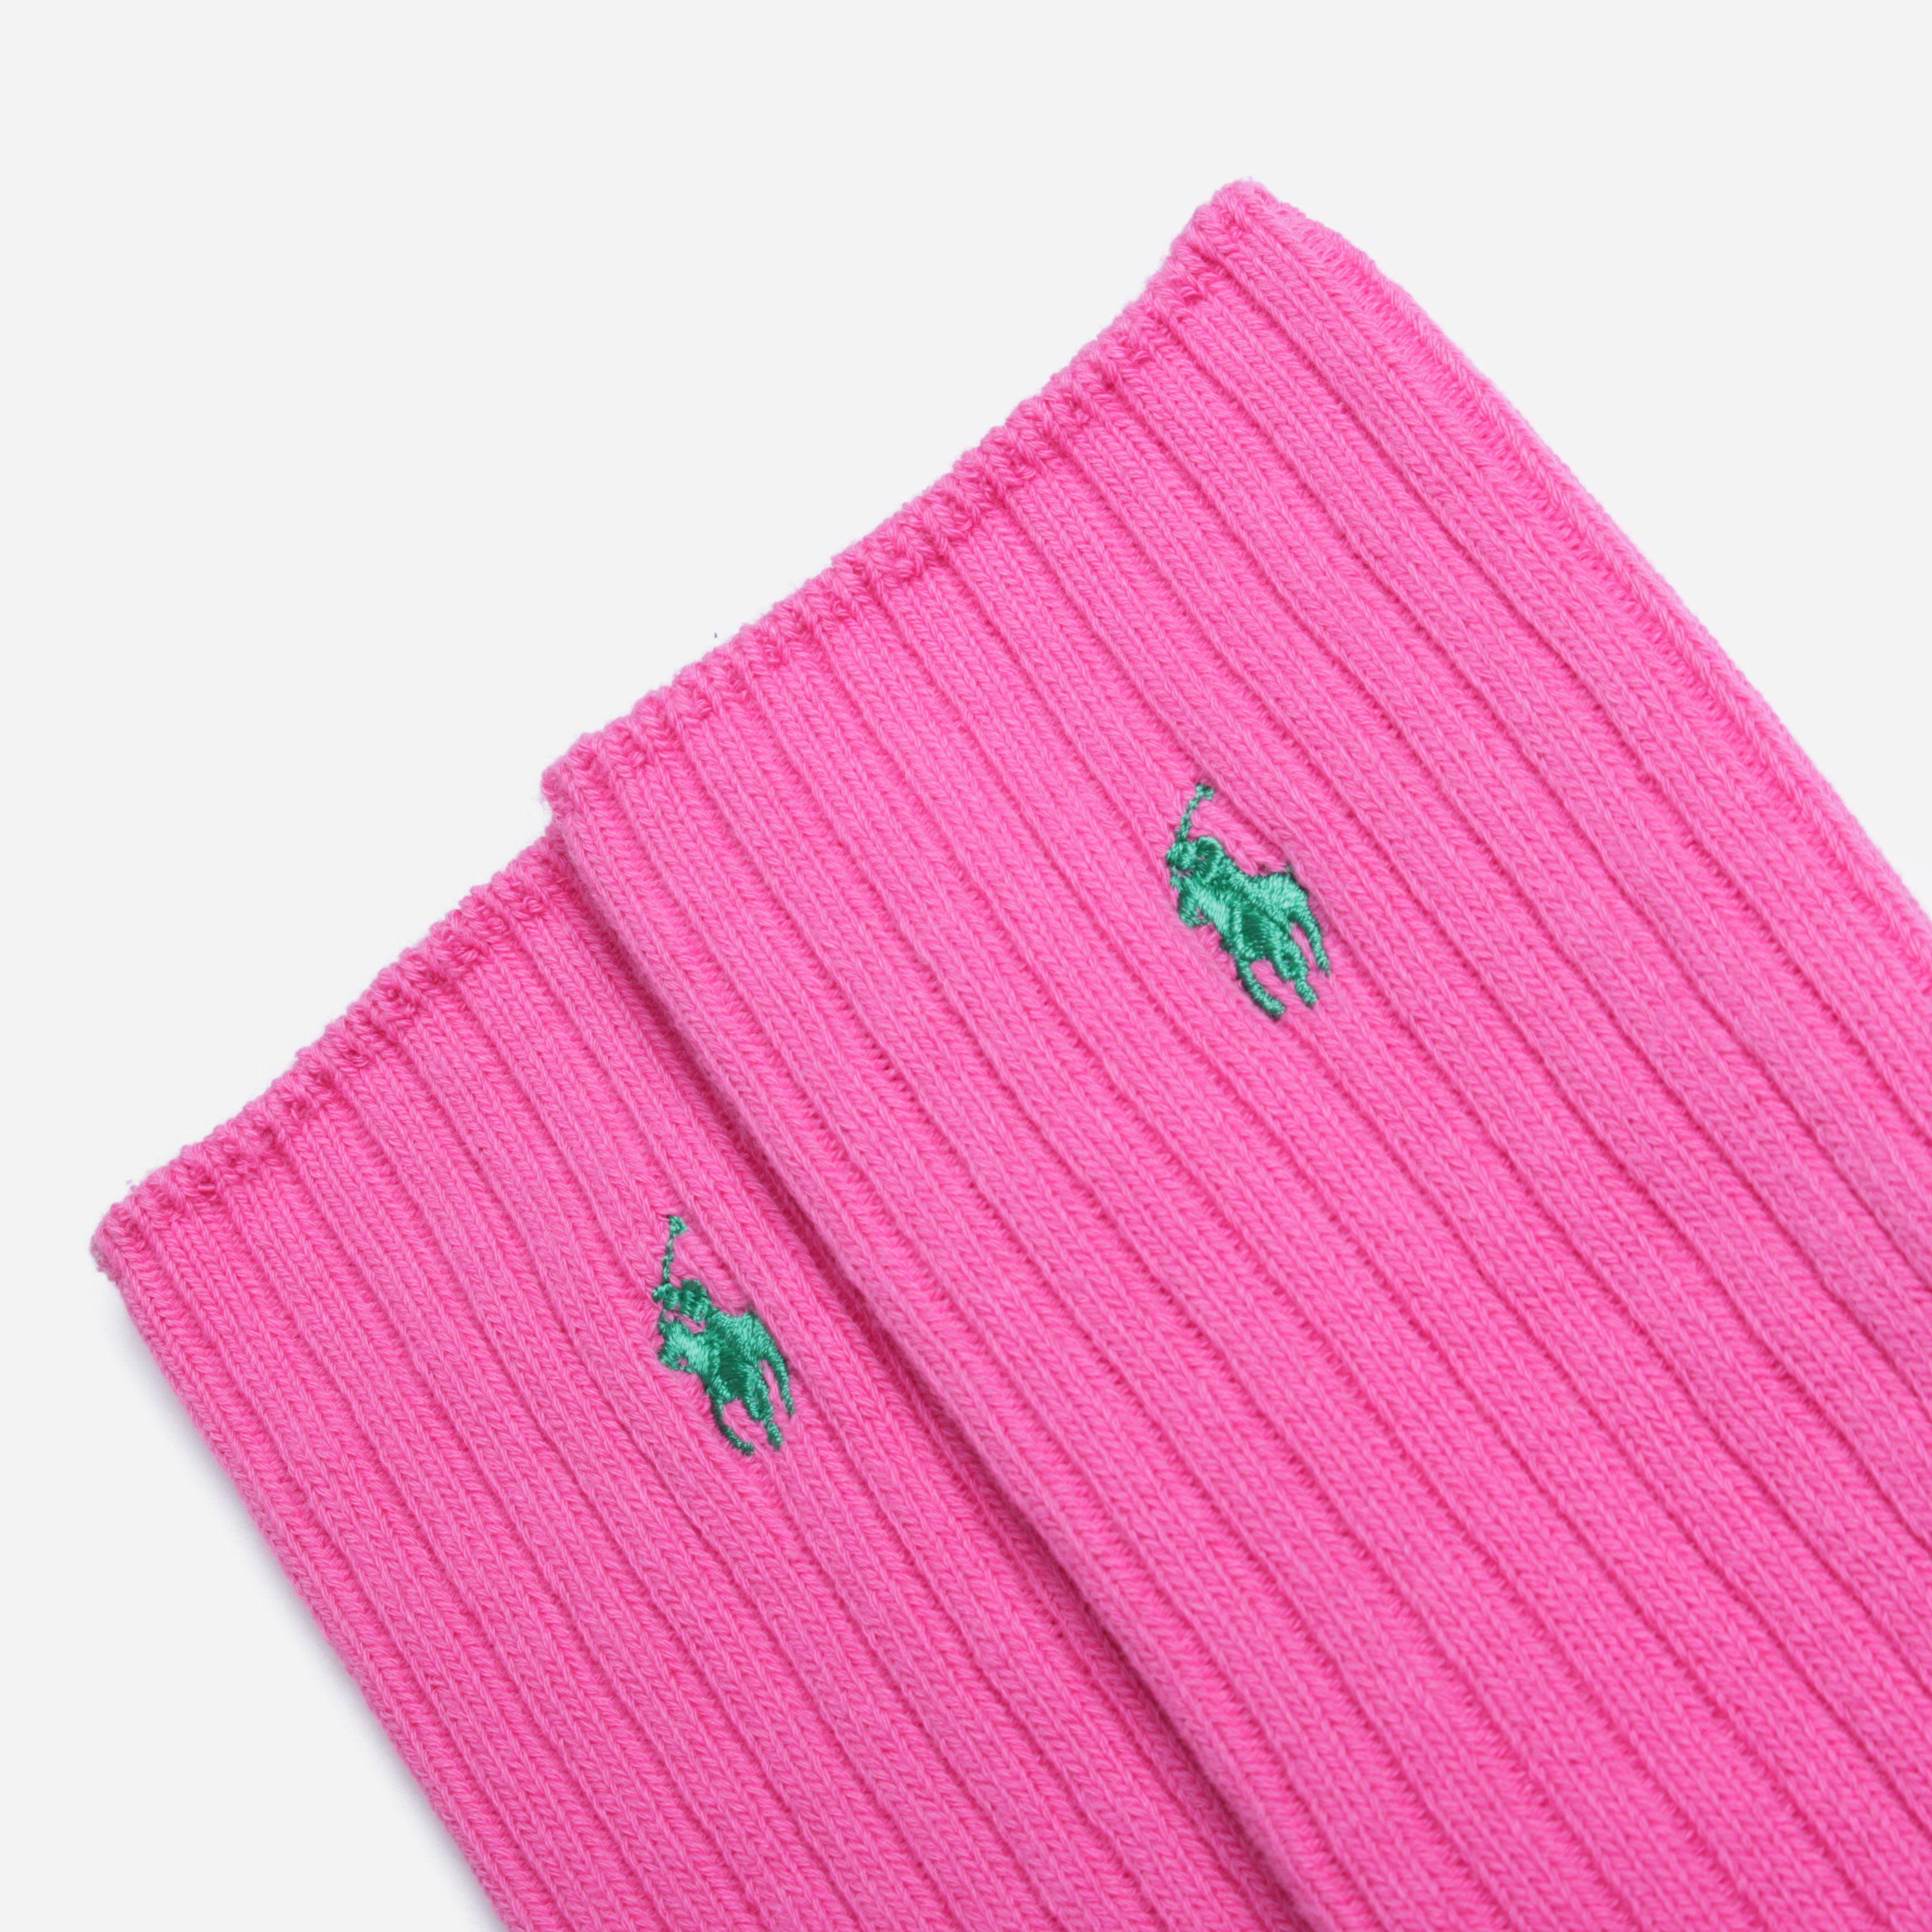 Polo Ralph Lauren Cotton Blend Classic Crew Socks